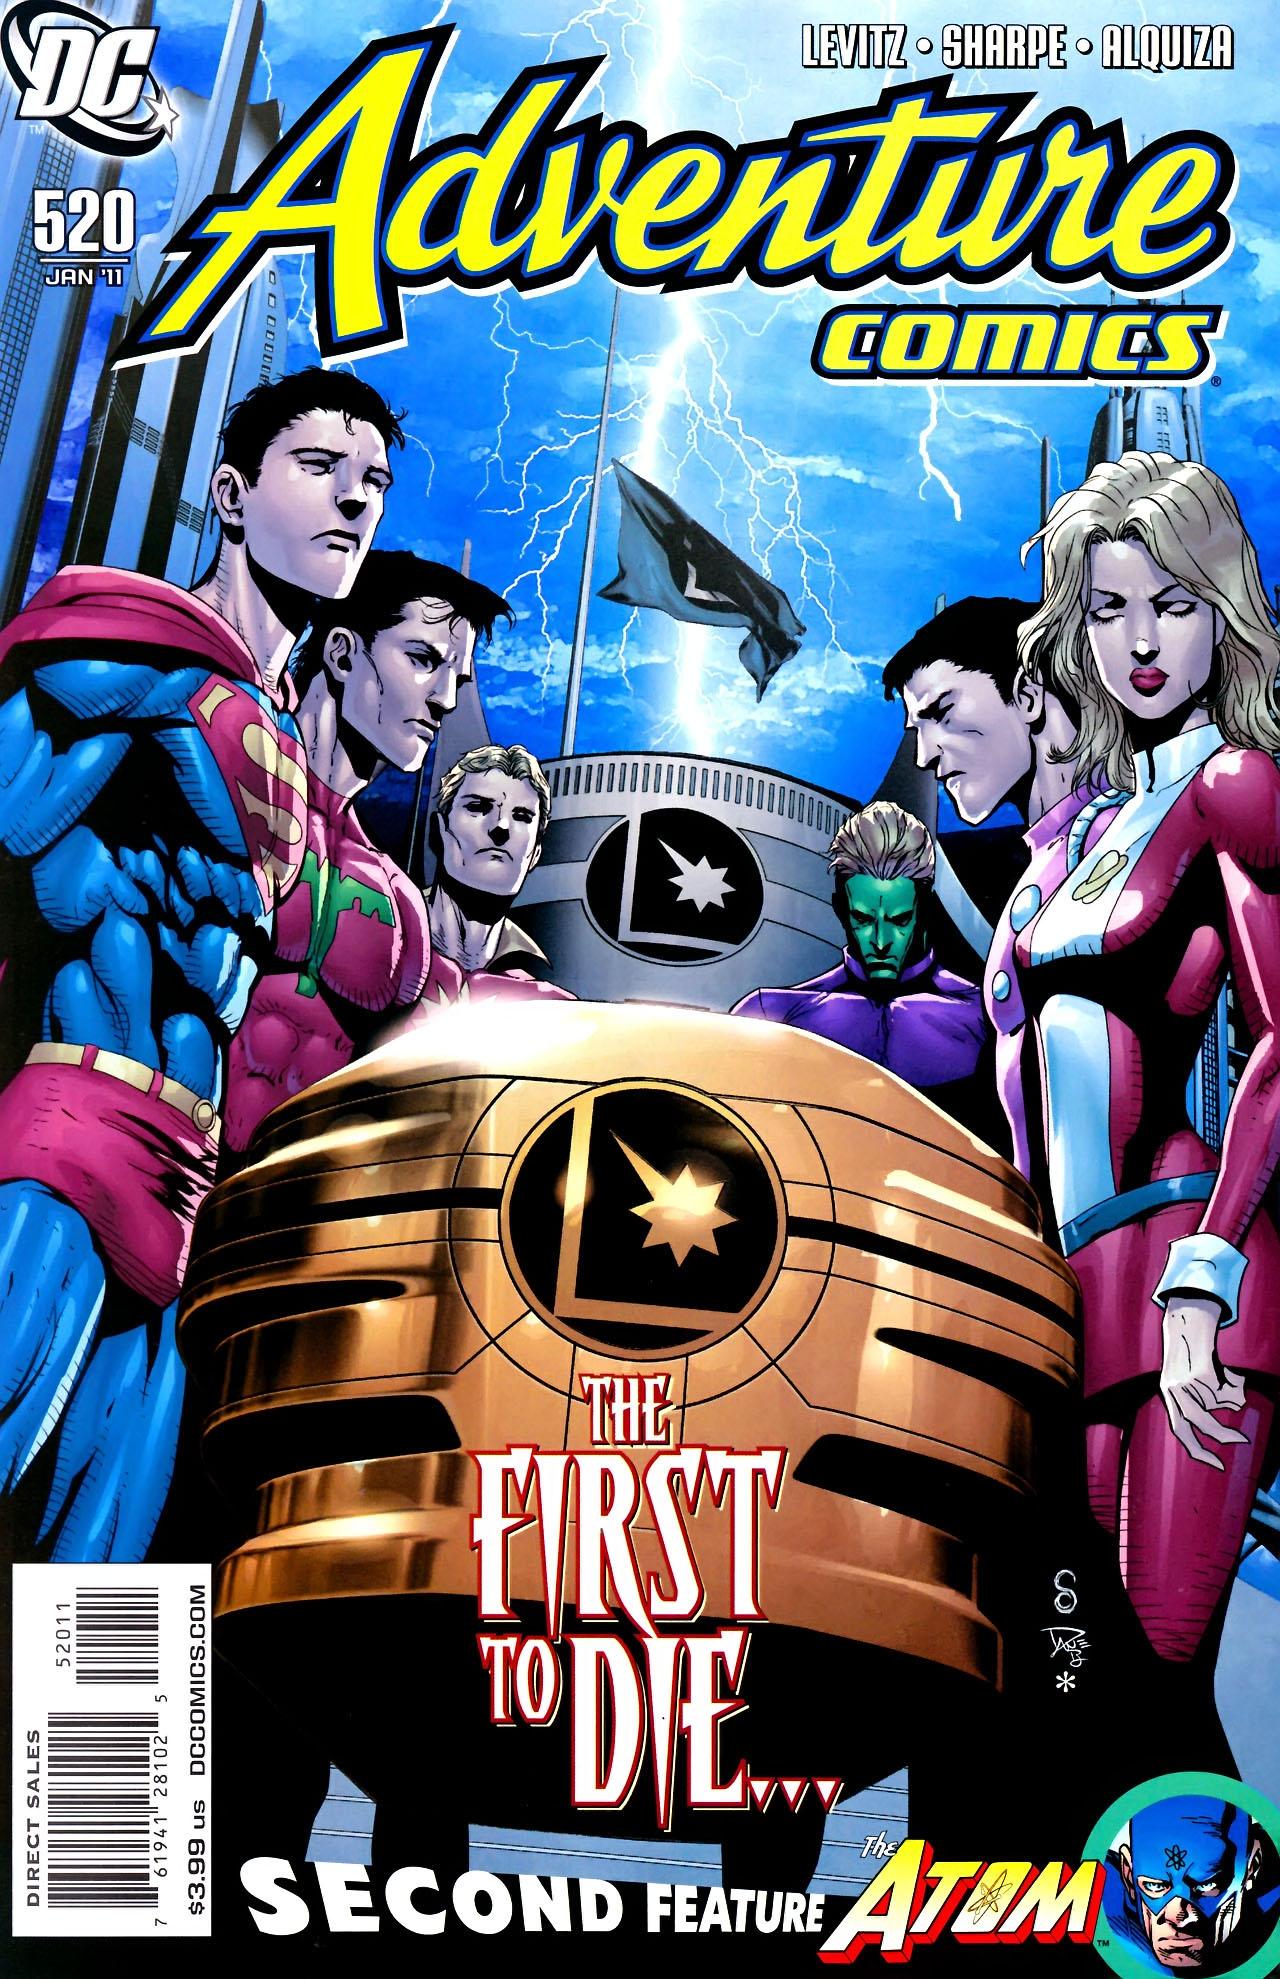 Read online Adventure Comics (1938) comic -  Issue #520 - 1